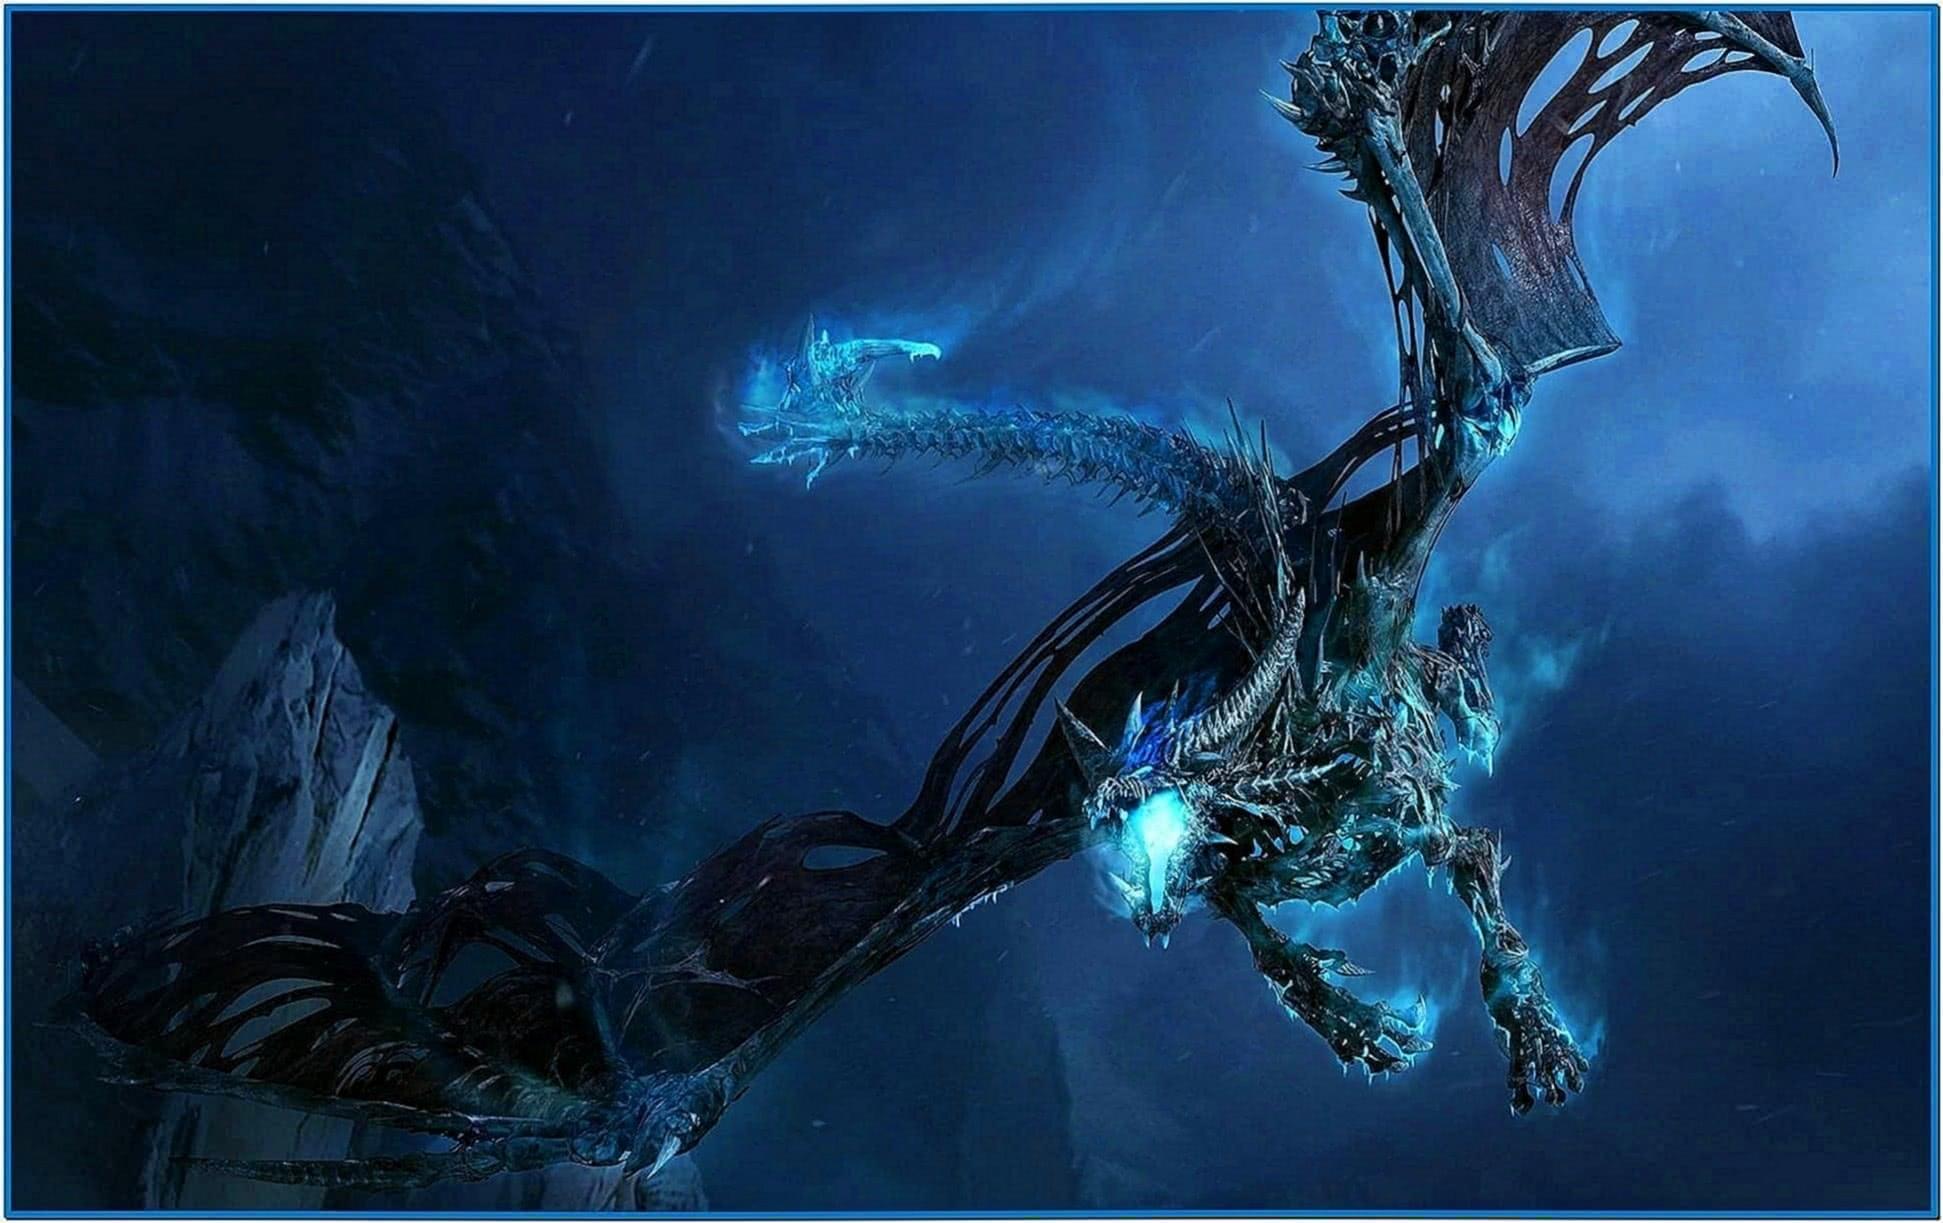 Screensavers Wallpaper Of Dragons Download For Free